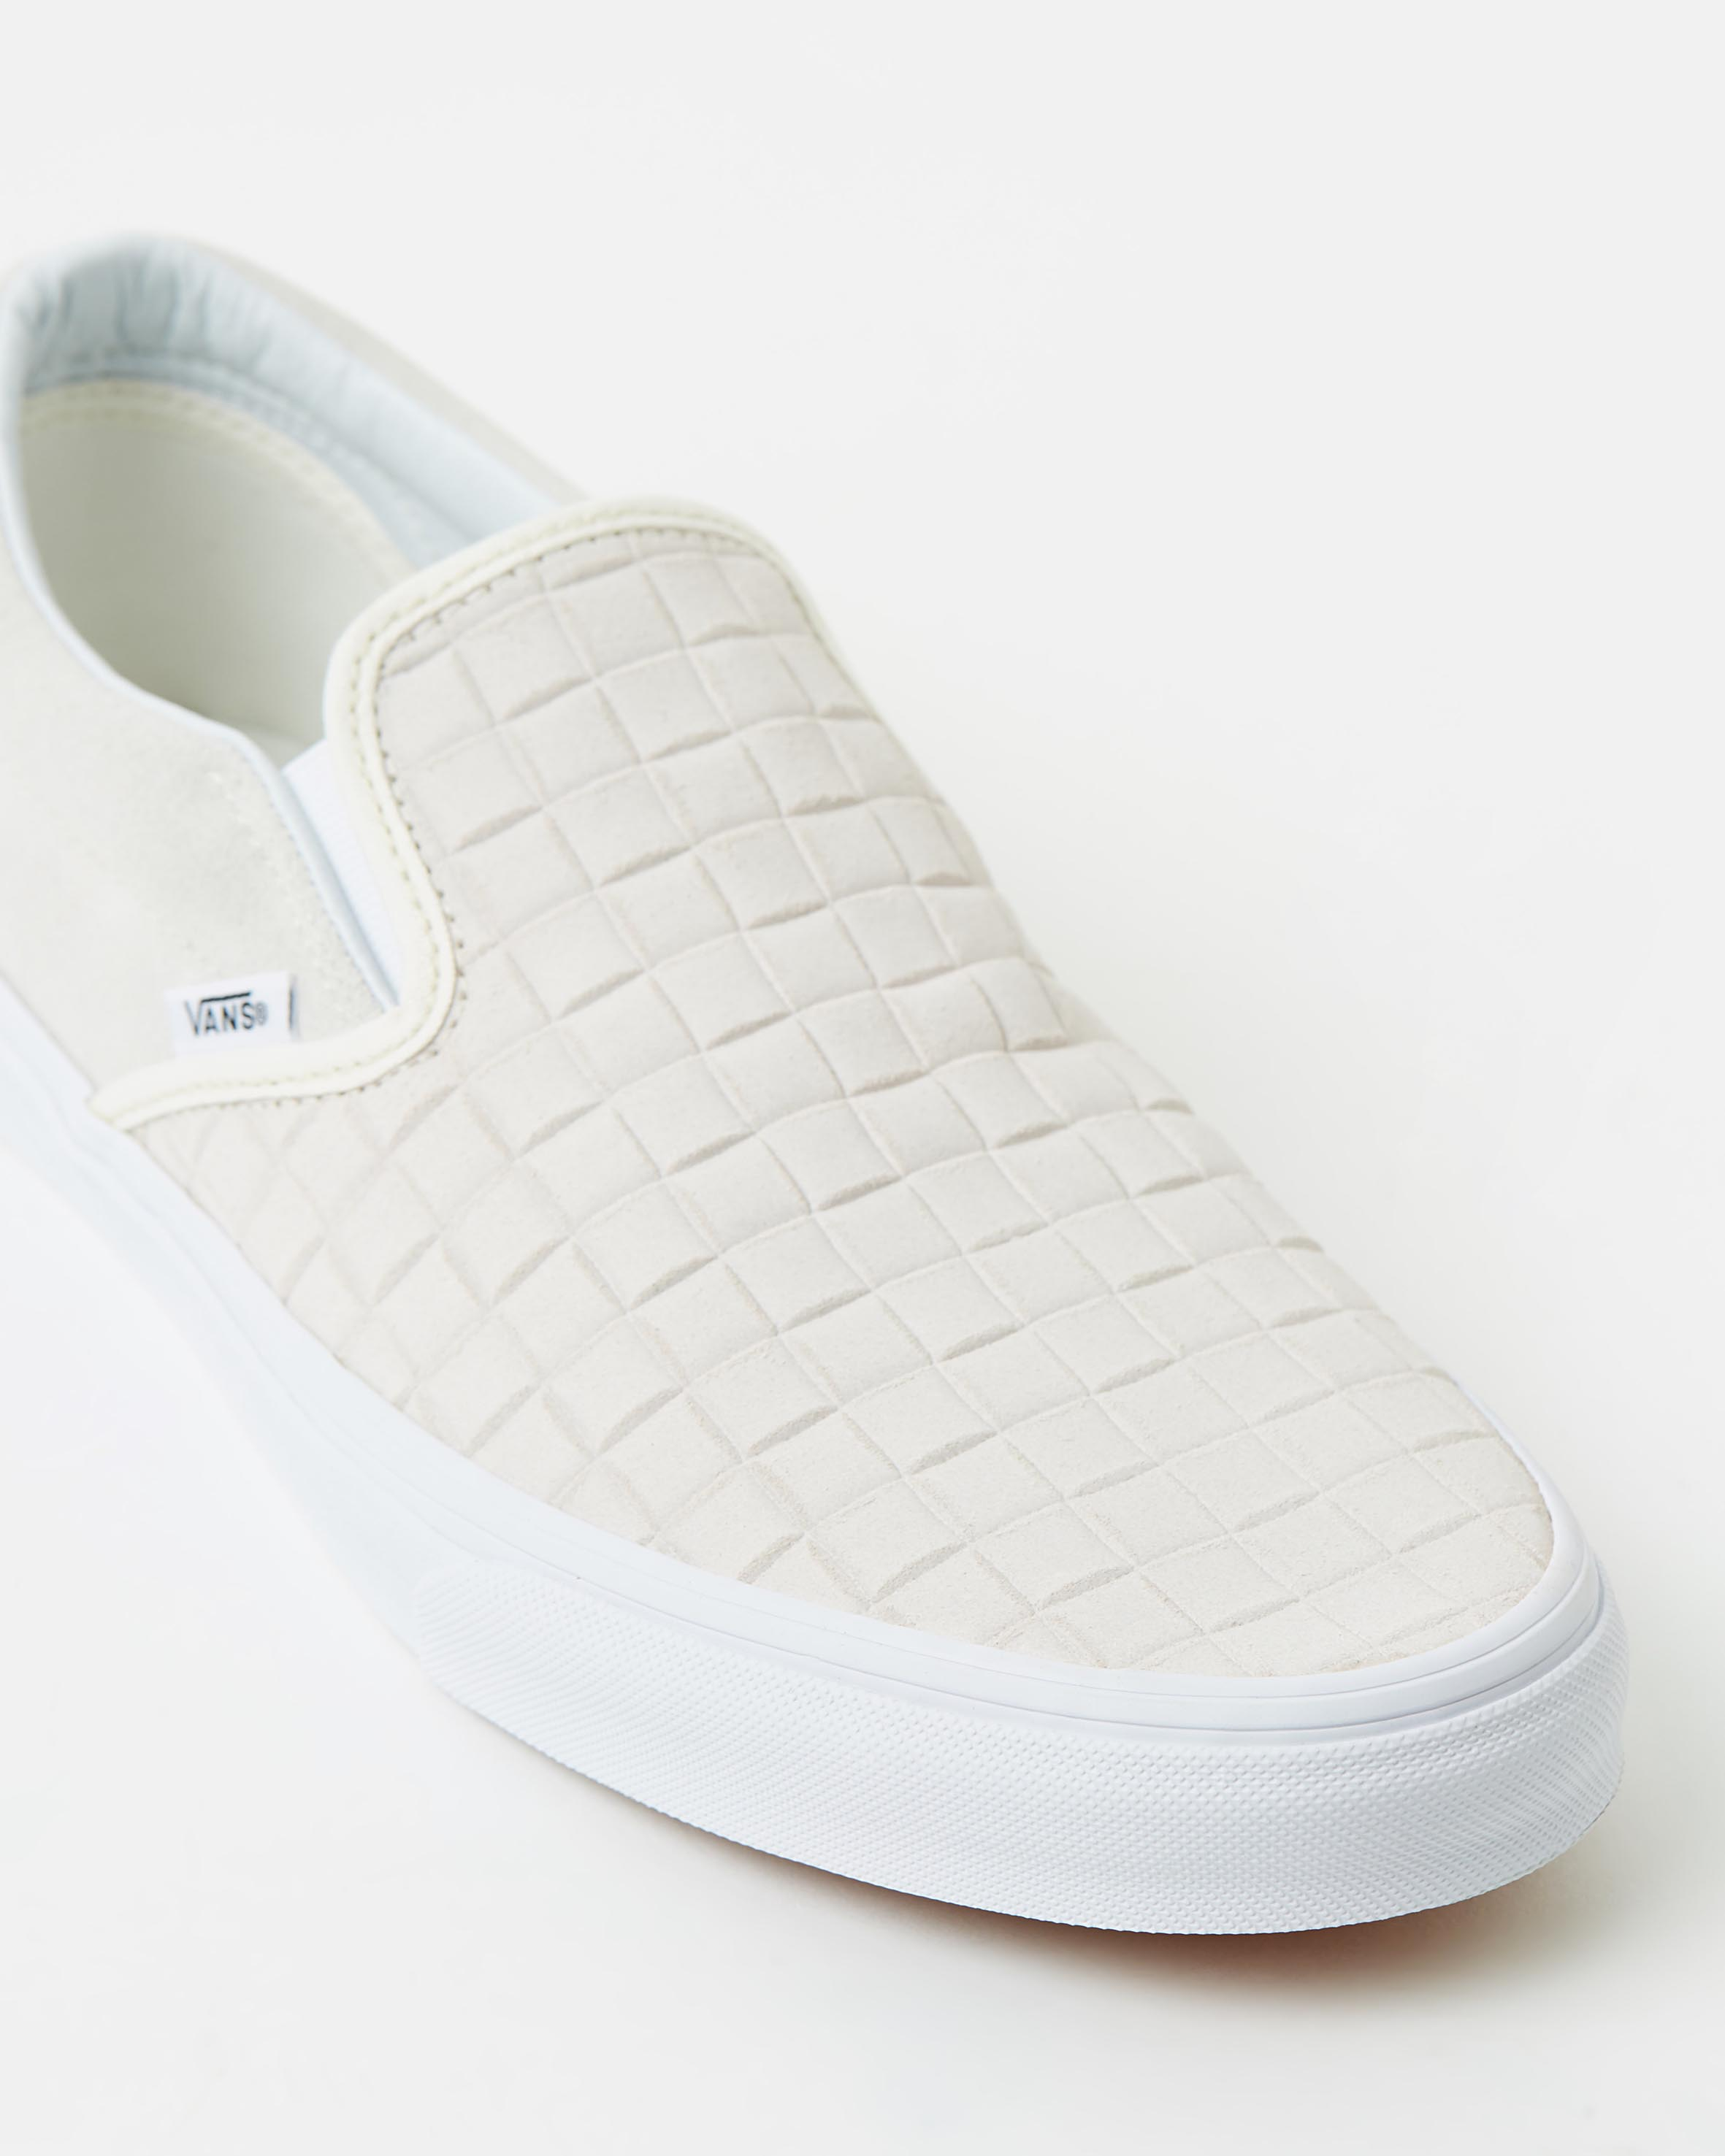 Vans Womens Classic Slip-On Suede Checkers Blanc De Blanc